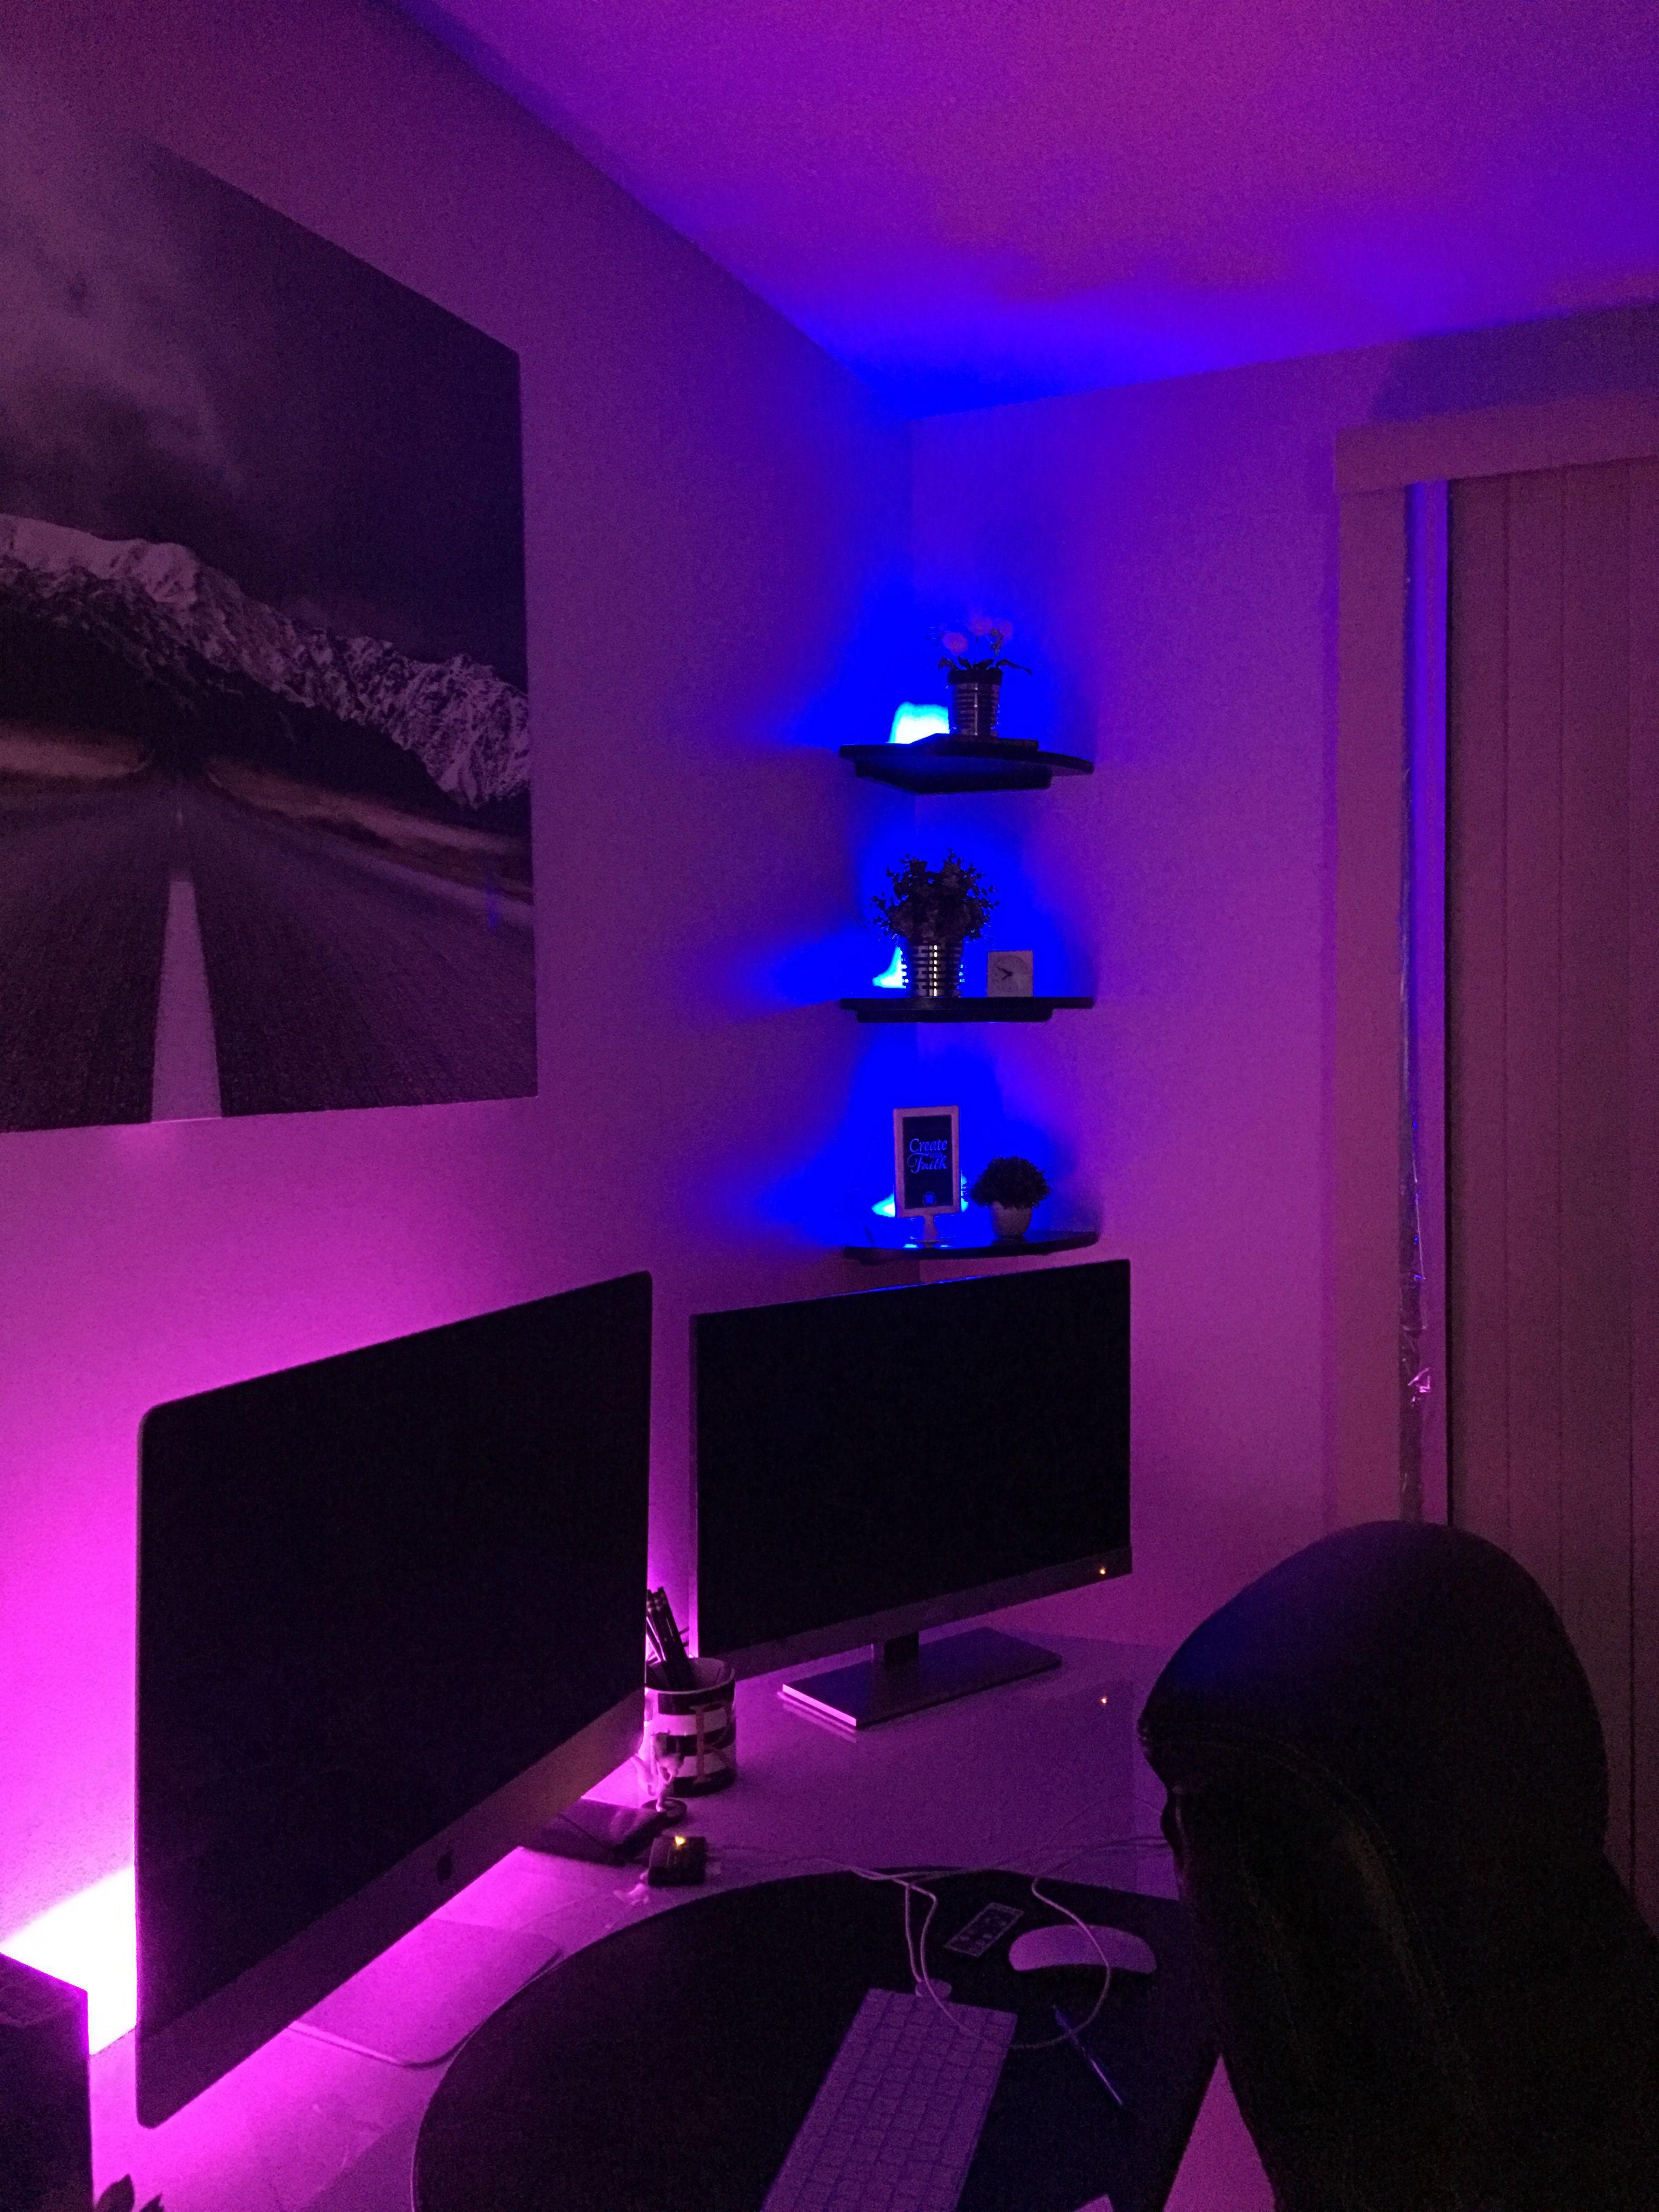 Home Office Led Mood Lighting Setup Light Strip From Ikea Dioder Led Lighting Strip Flexible Led Lighting Bedroom Led Strip Lights Bedroom Small Room Bedroom